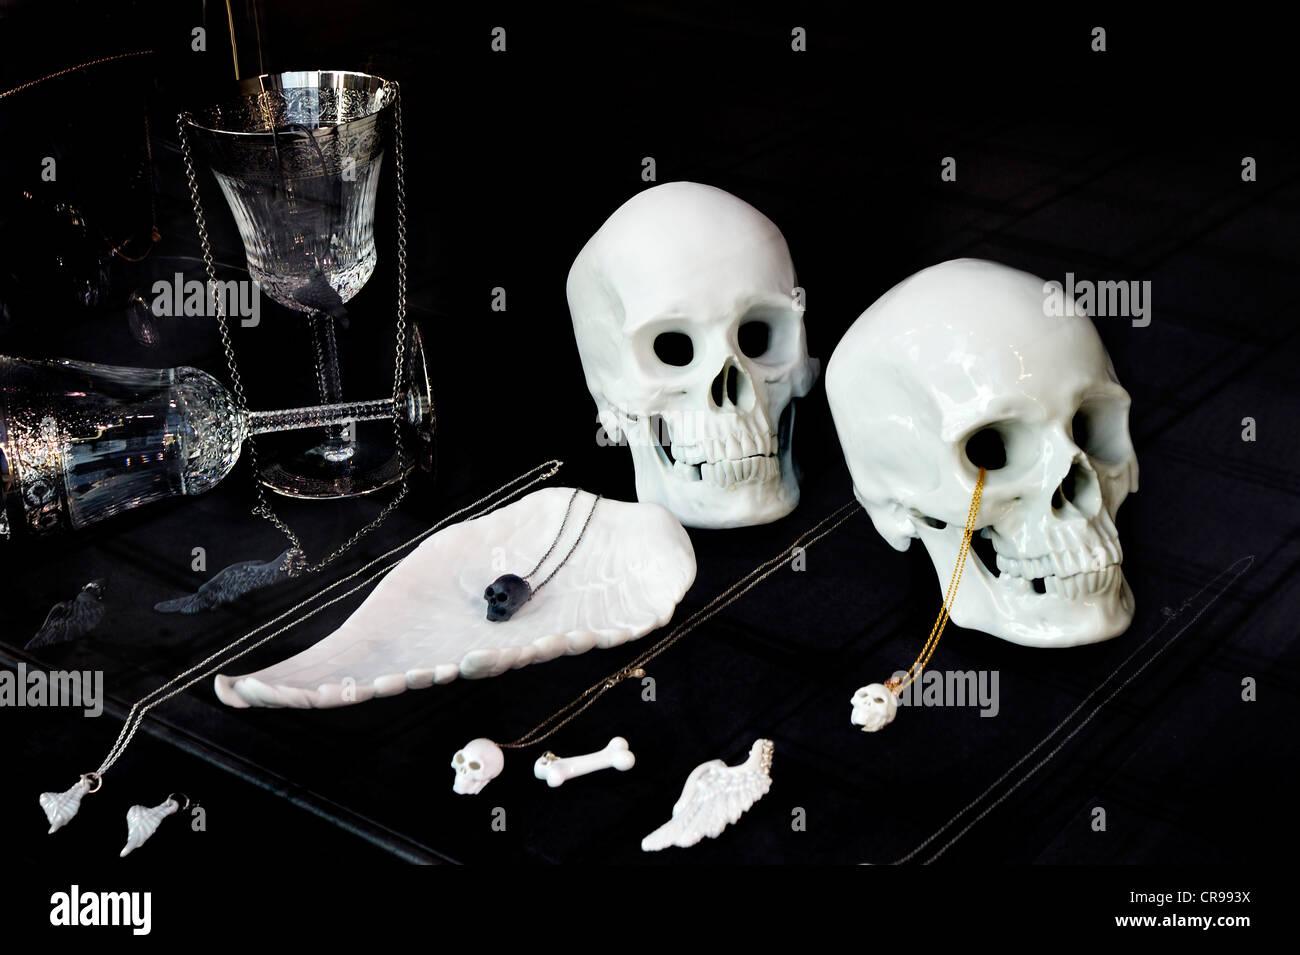 Showcase of jewellery with porcelain skulls - Stock Image